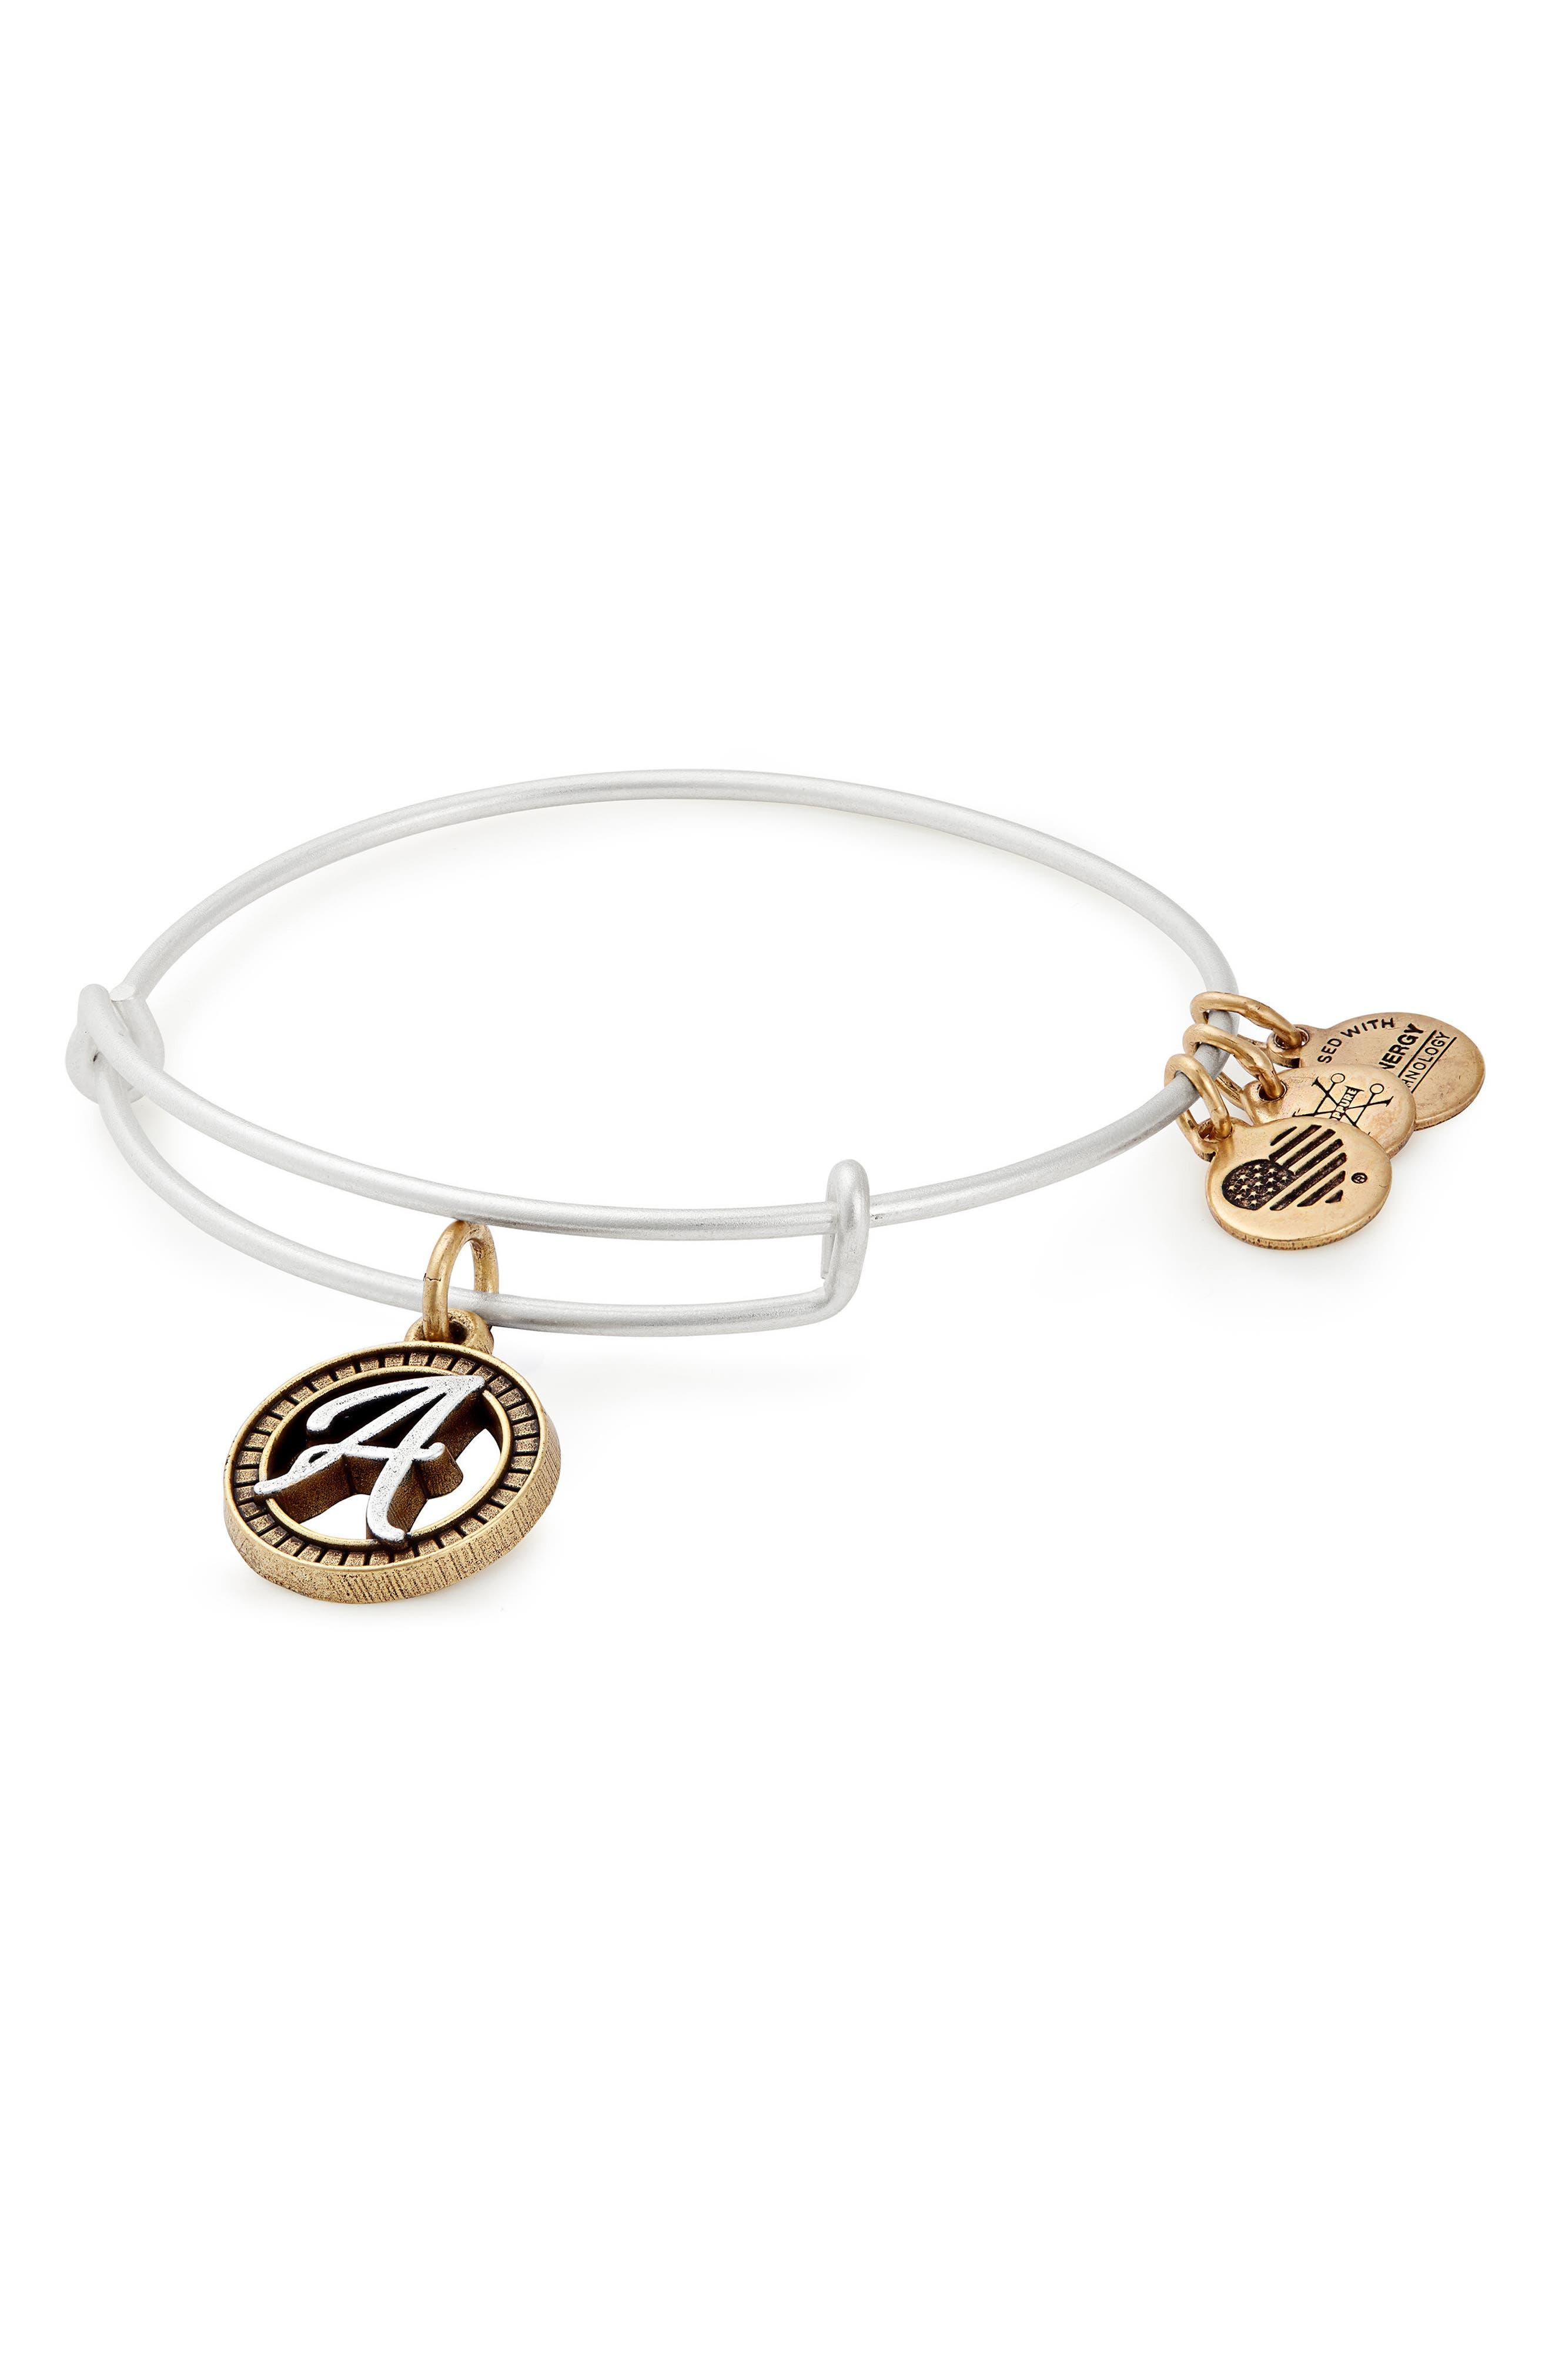 Two-Tone Initial Charm Expandable Bracelet,                         Main,                         color, Two-Tone-A